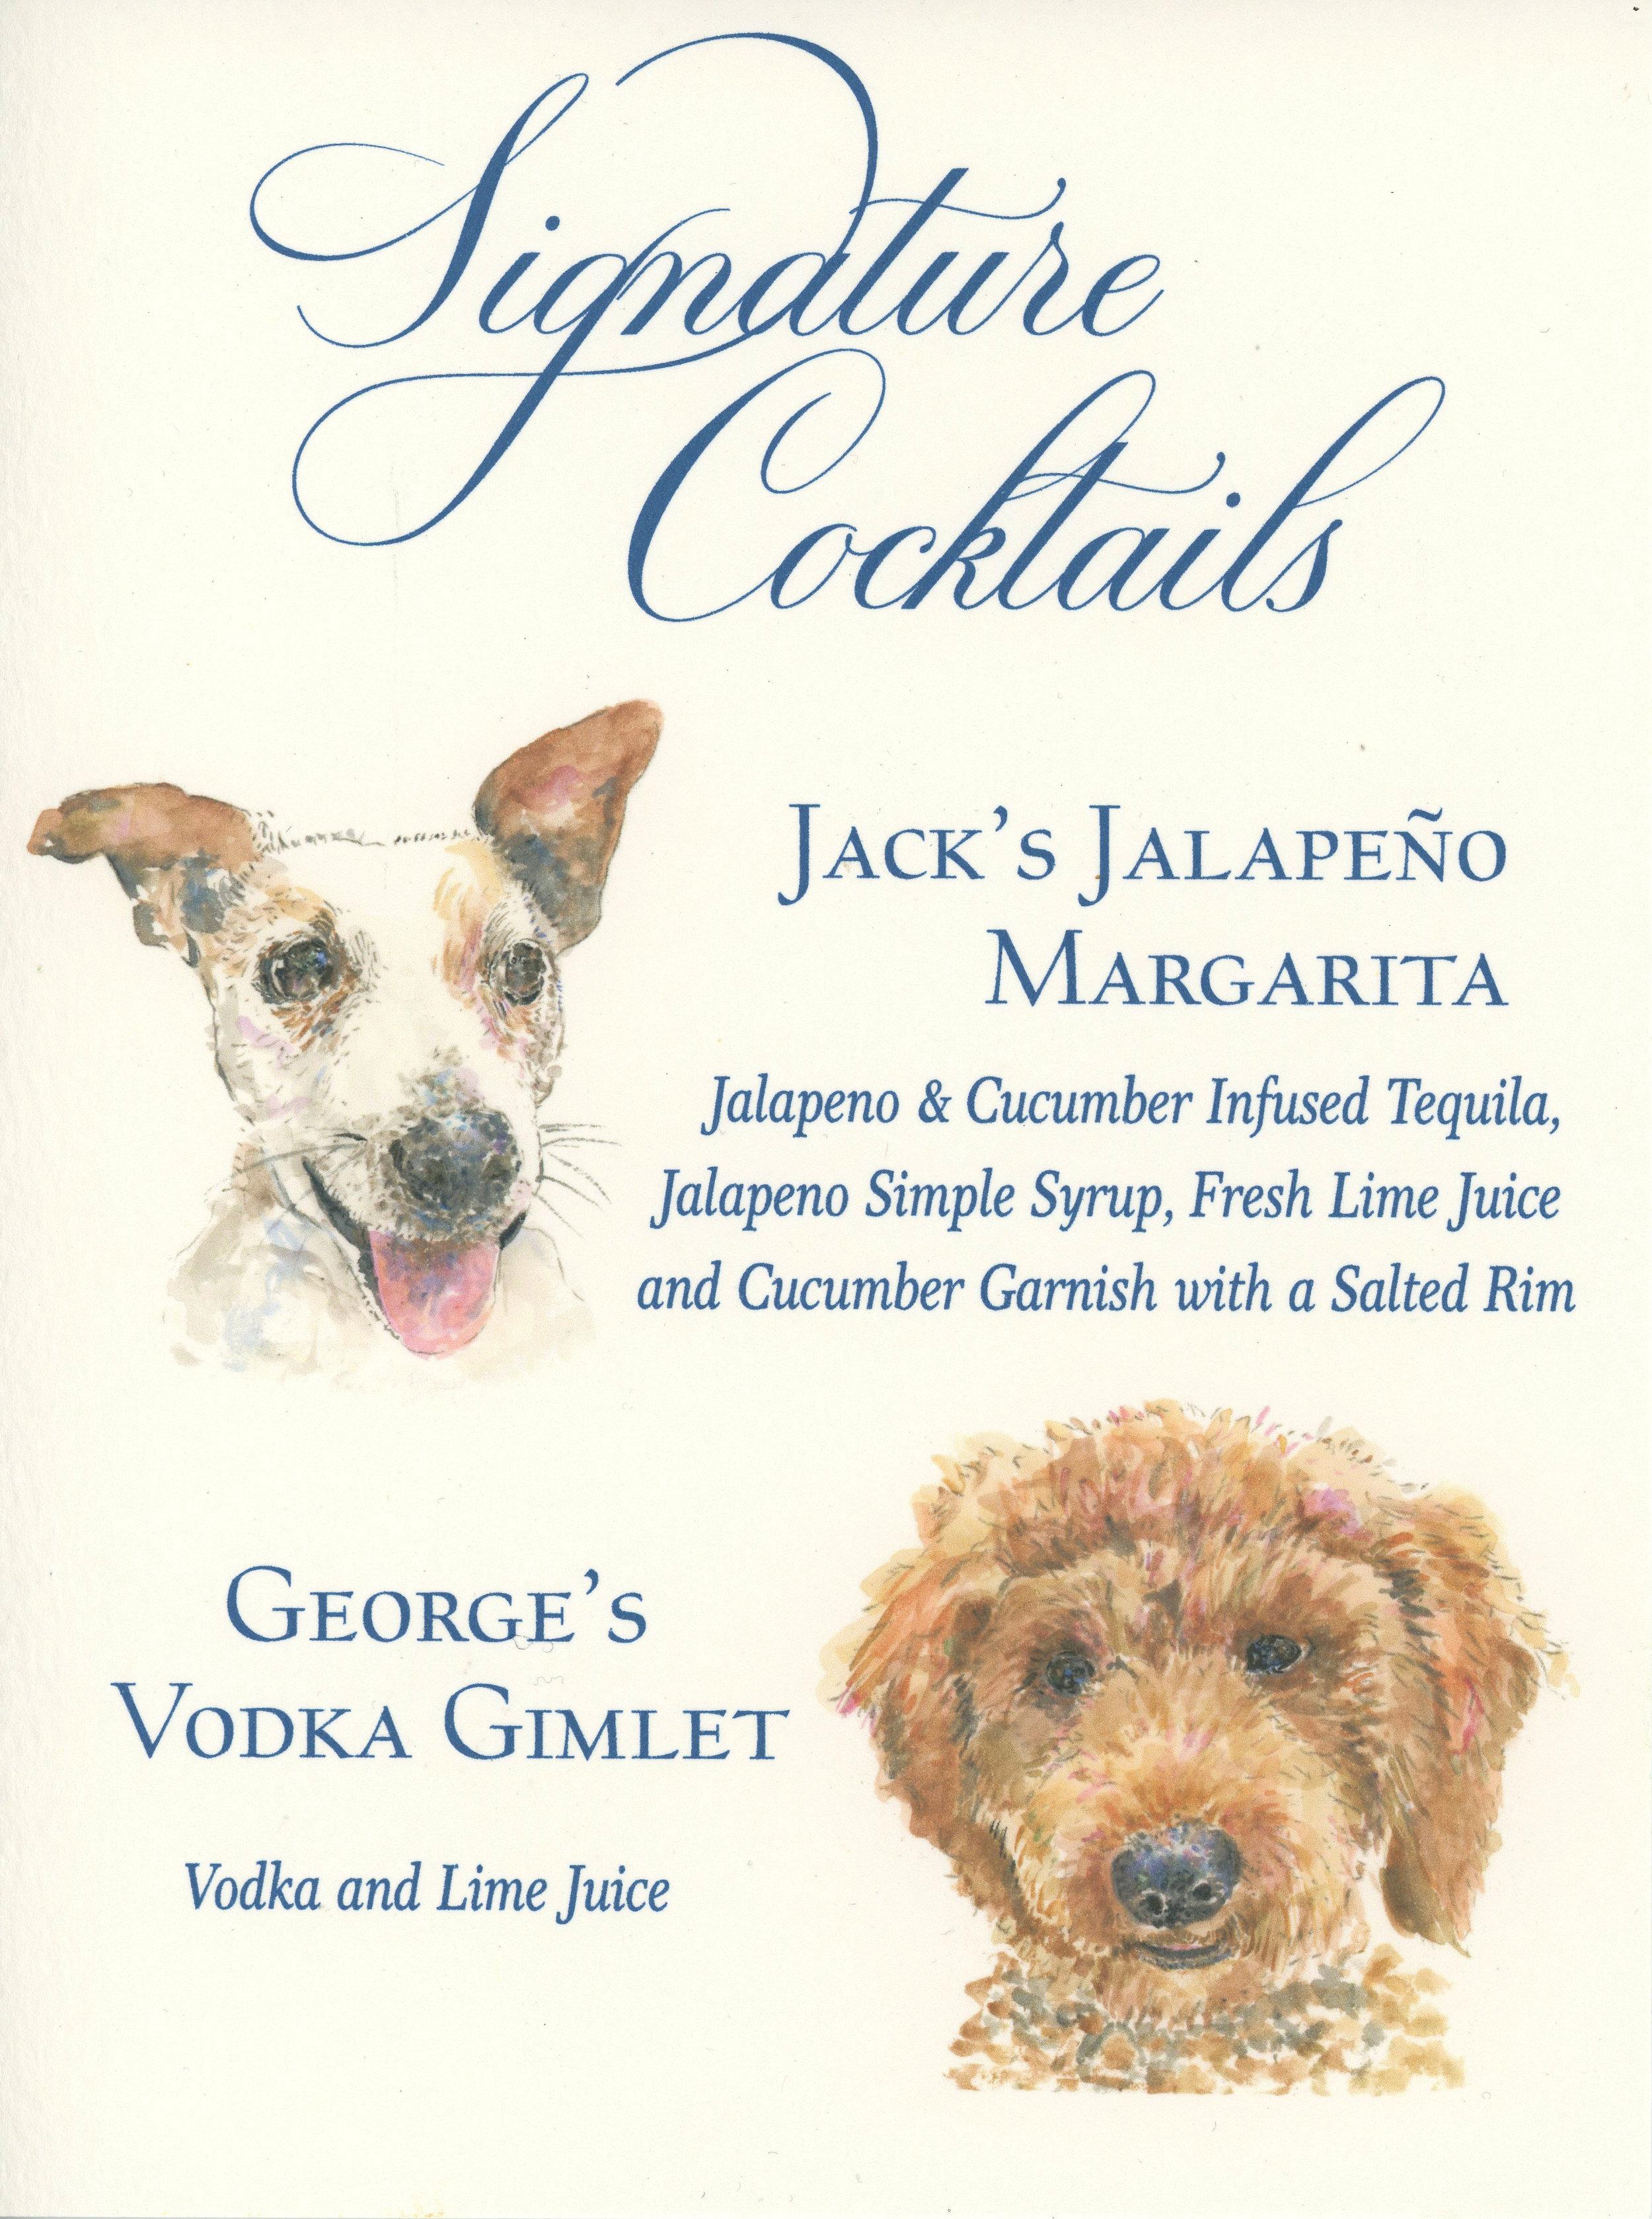 Dog Signature Cocktails.jpg